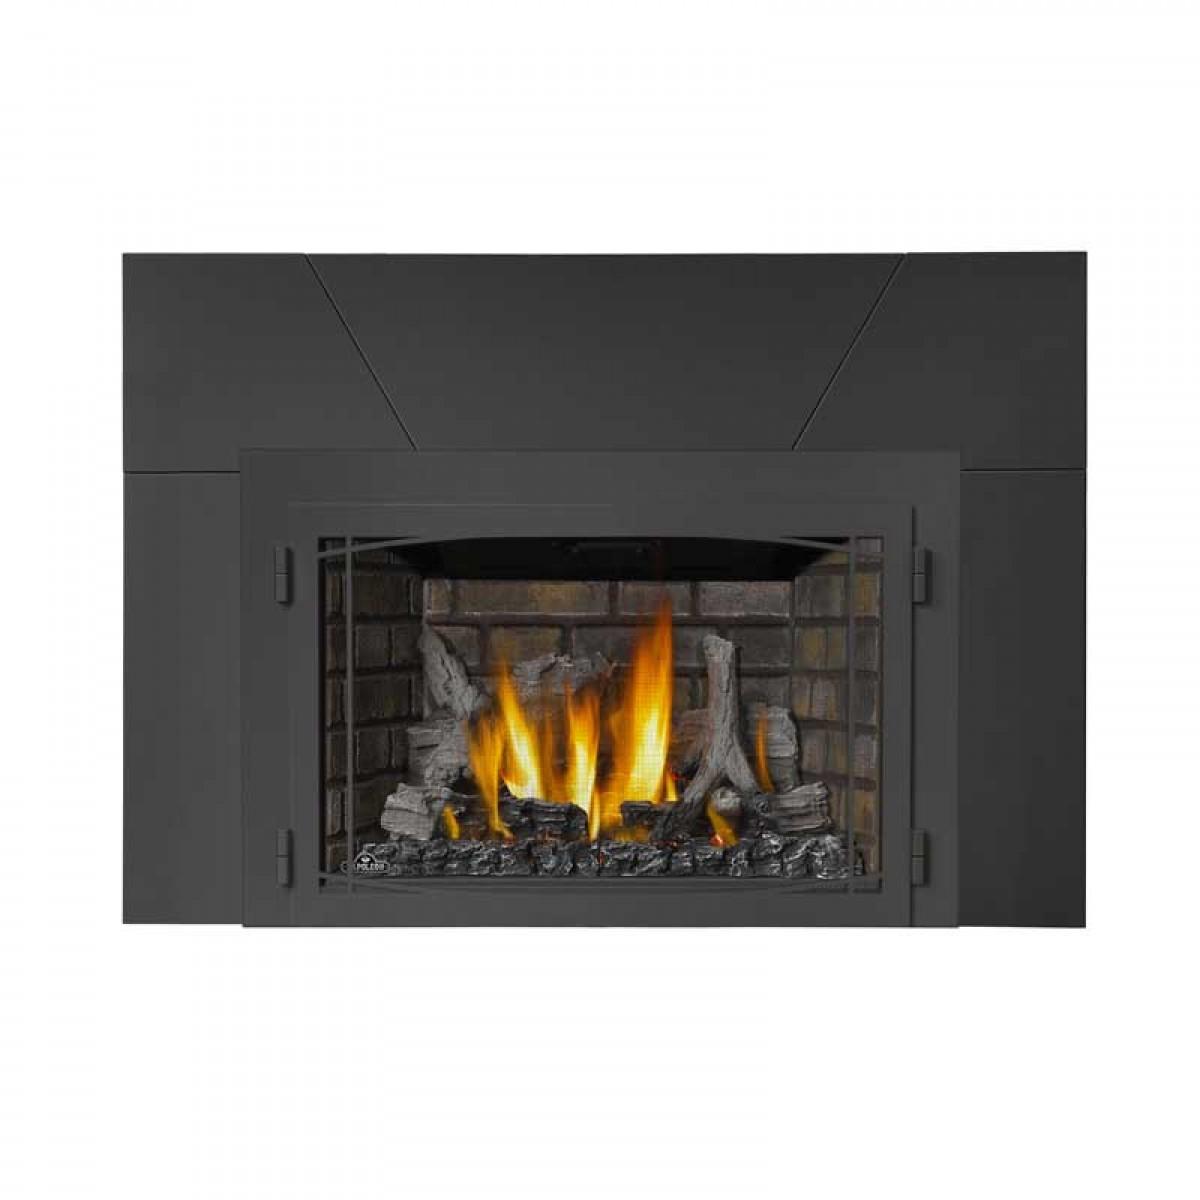 Napoleon IR3 Infrared Series Gas Fireplace Insert